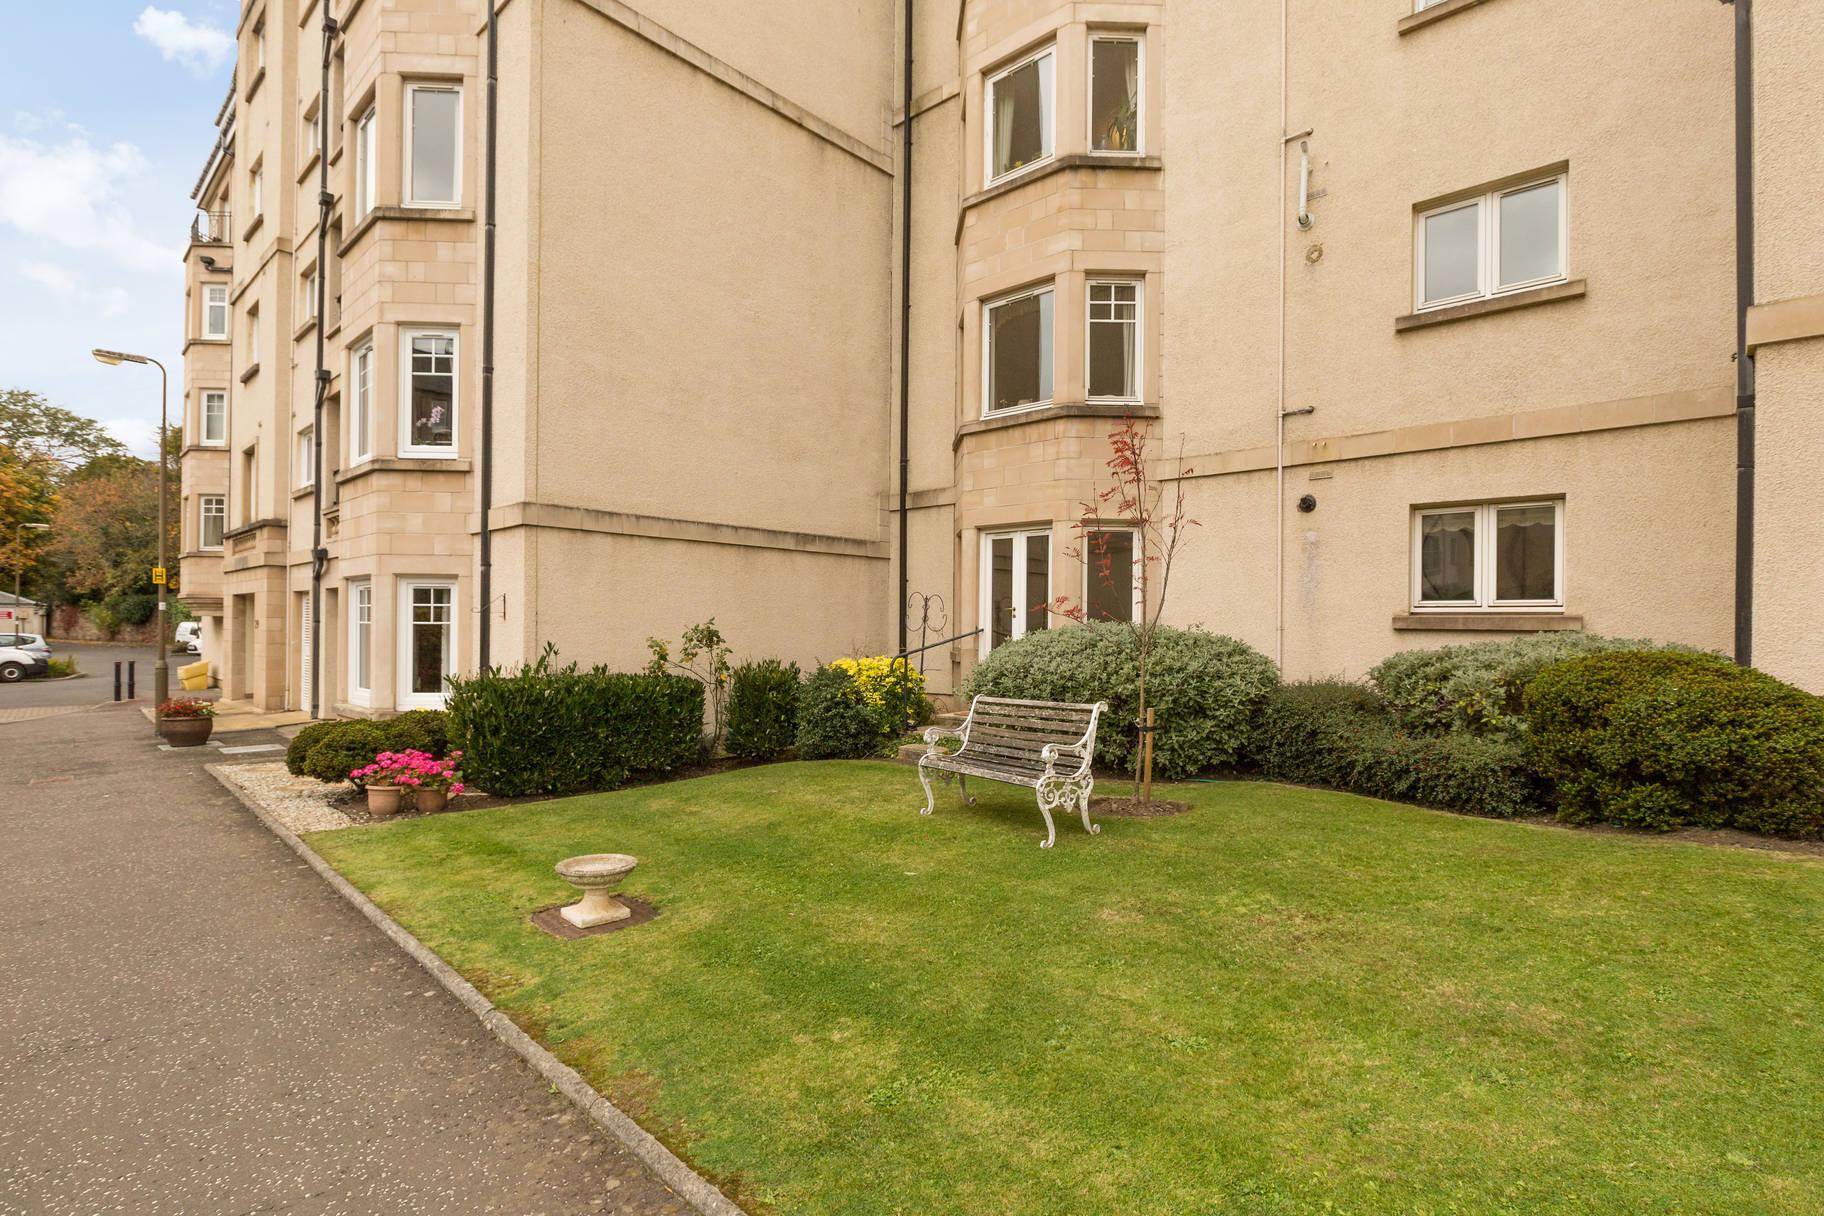 27/1 Maxwell Street, Morningside, Edinburgh, EH10 5FT